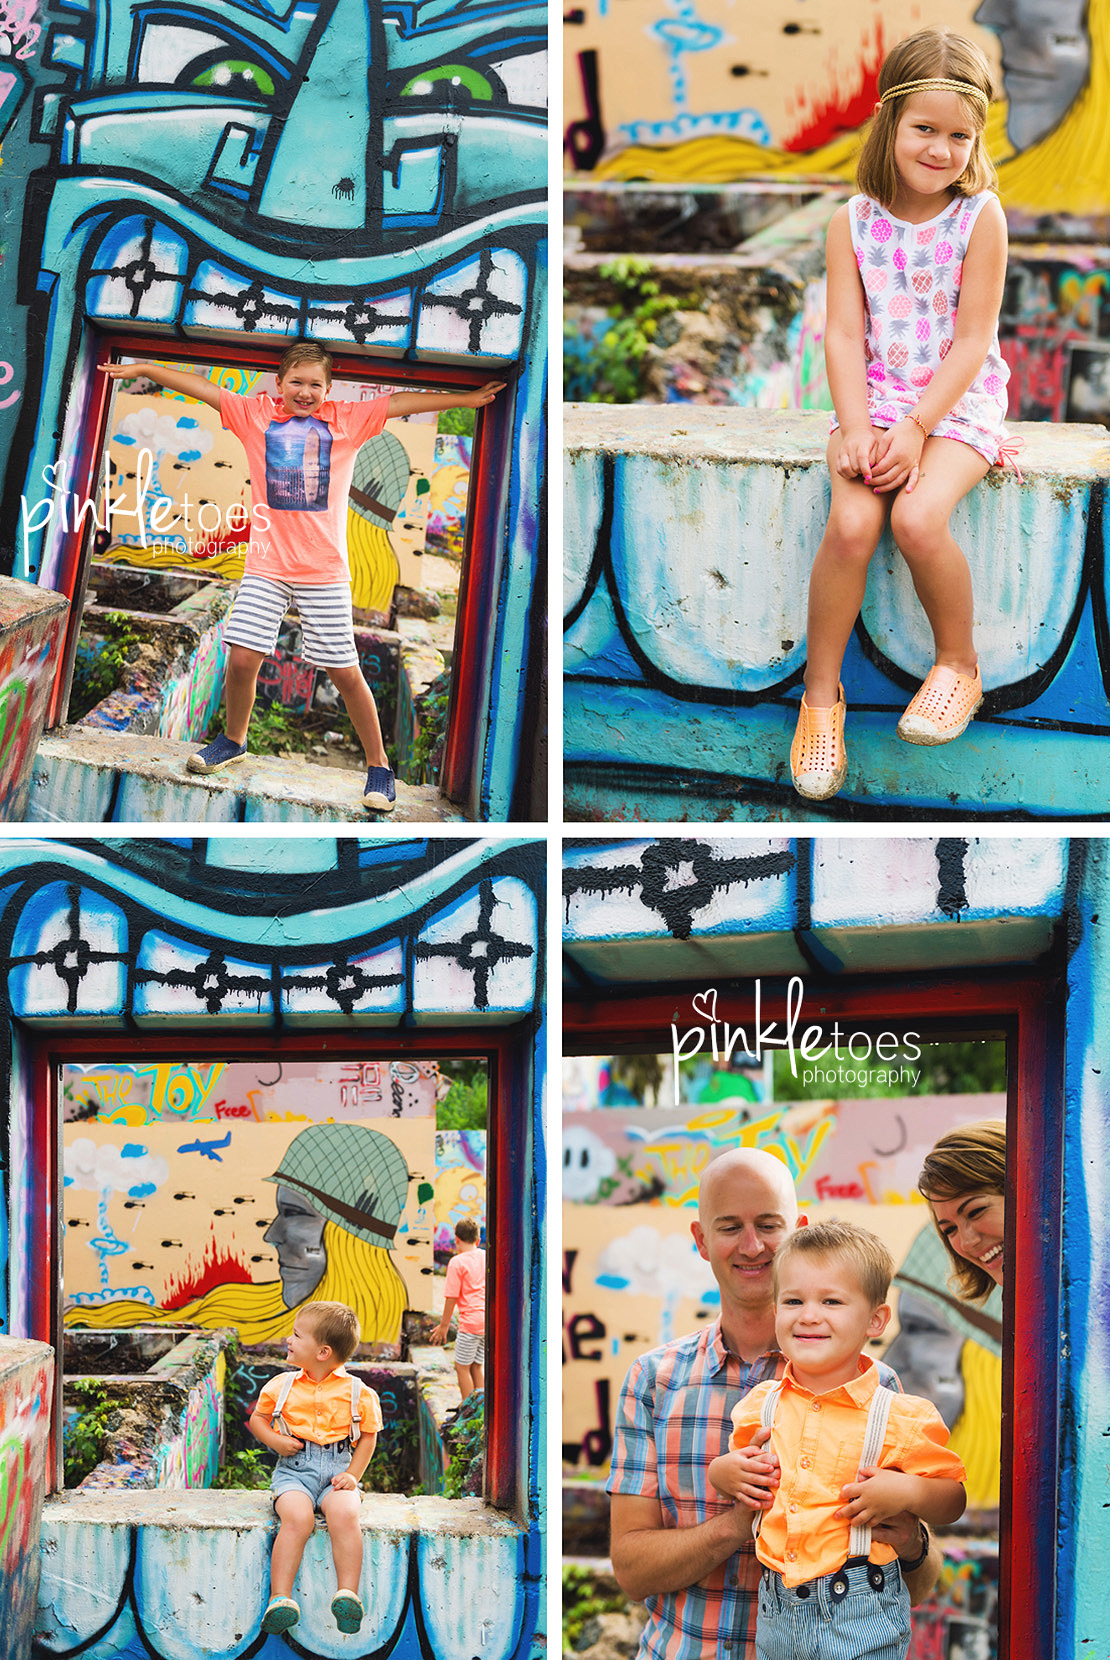 austin-graffiti-park-family-urban-colorful-kids-photography-05